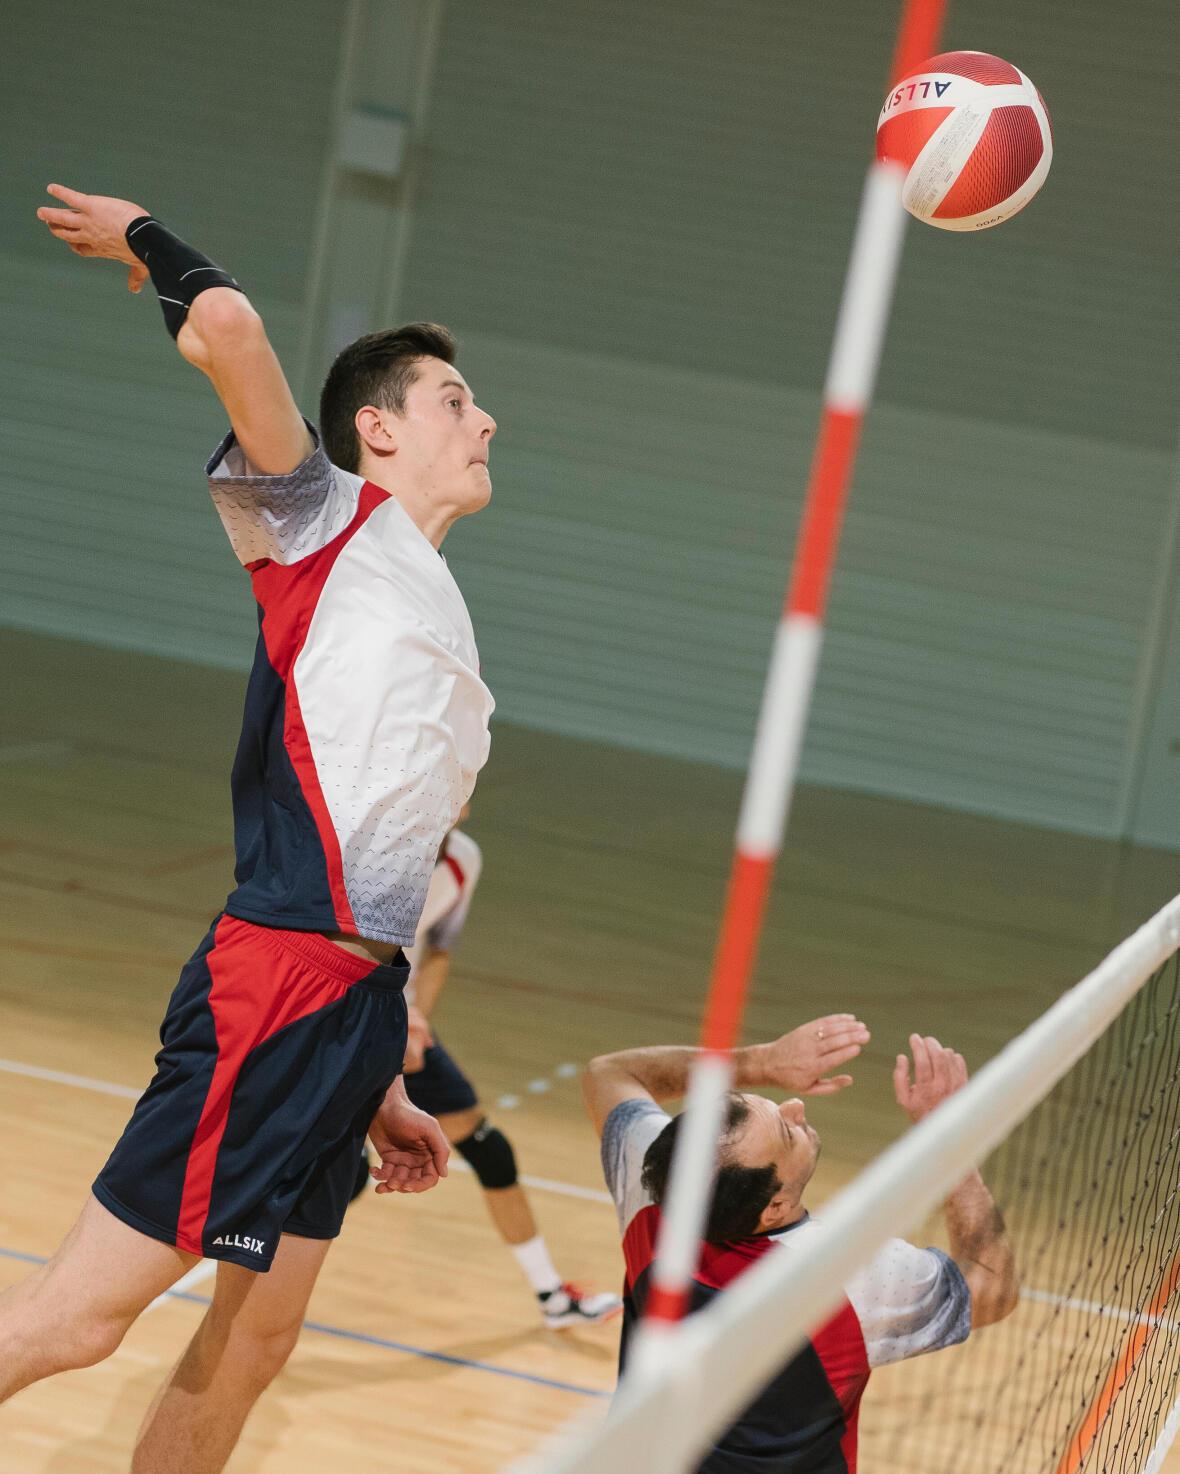 comunicar-voleibol-allsix